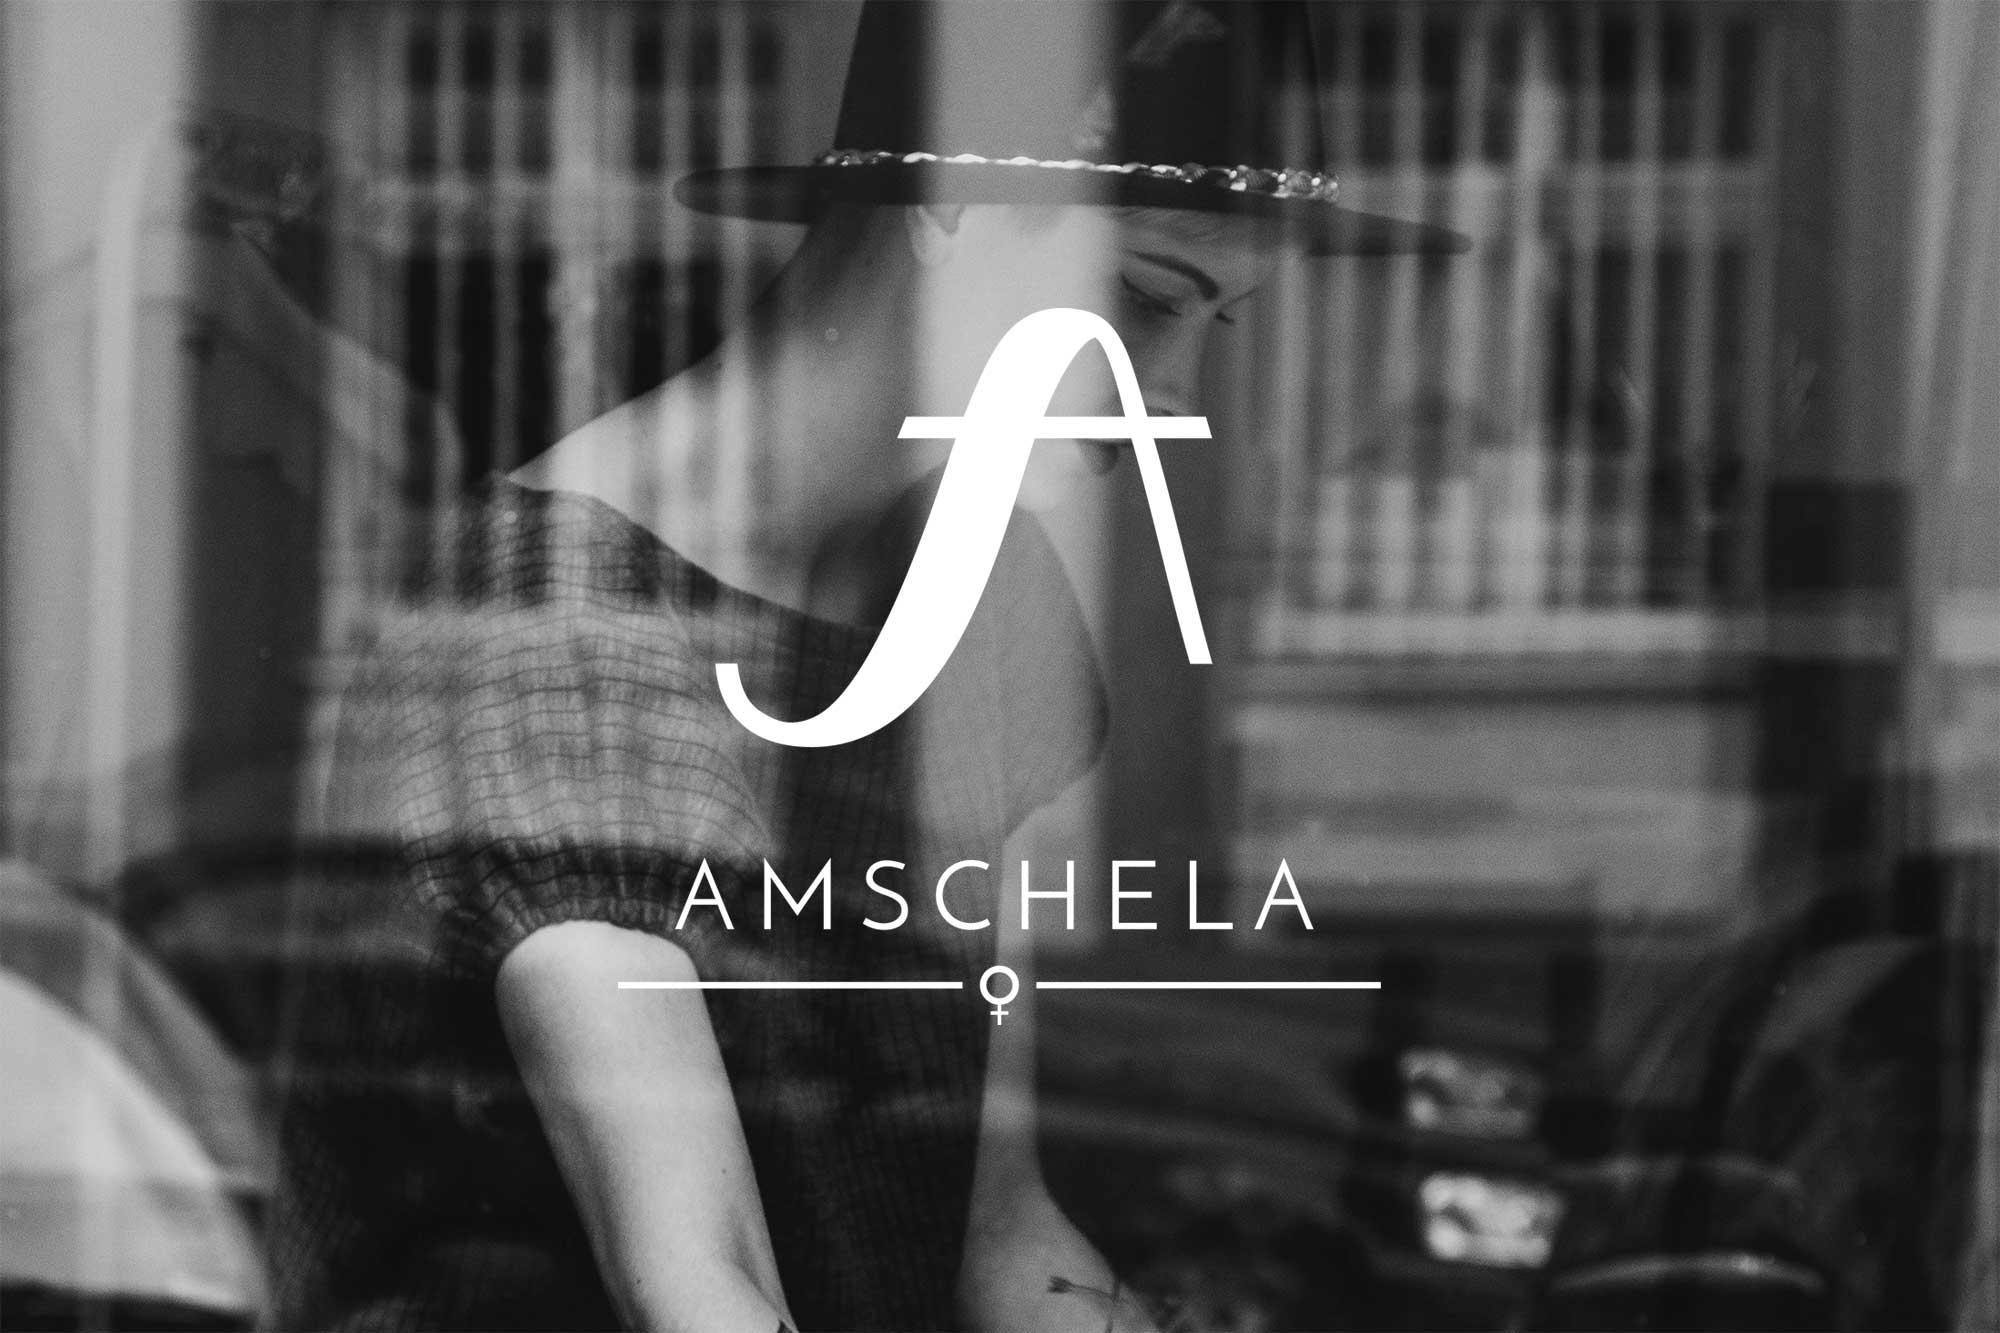 Amschela logo on background